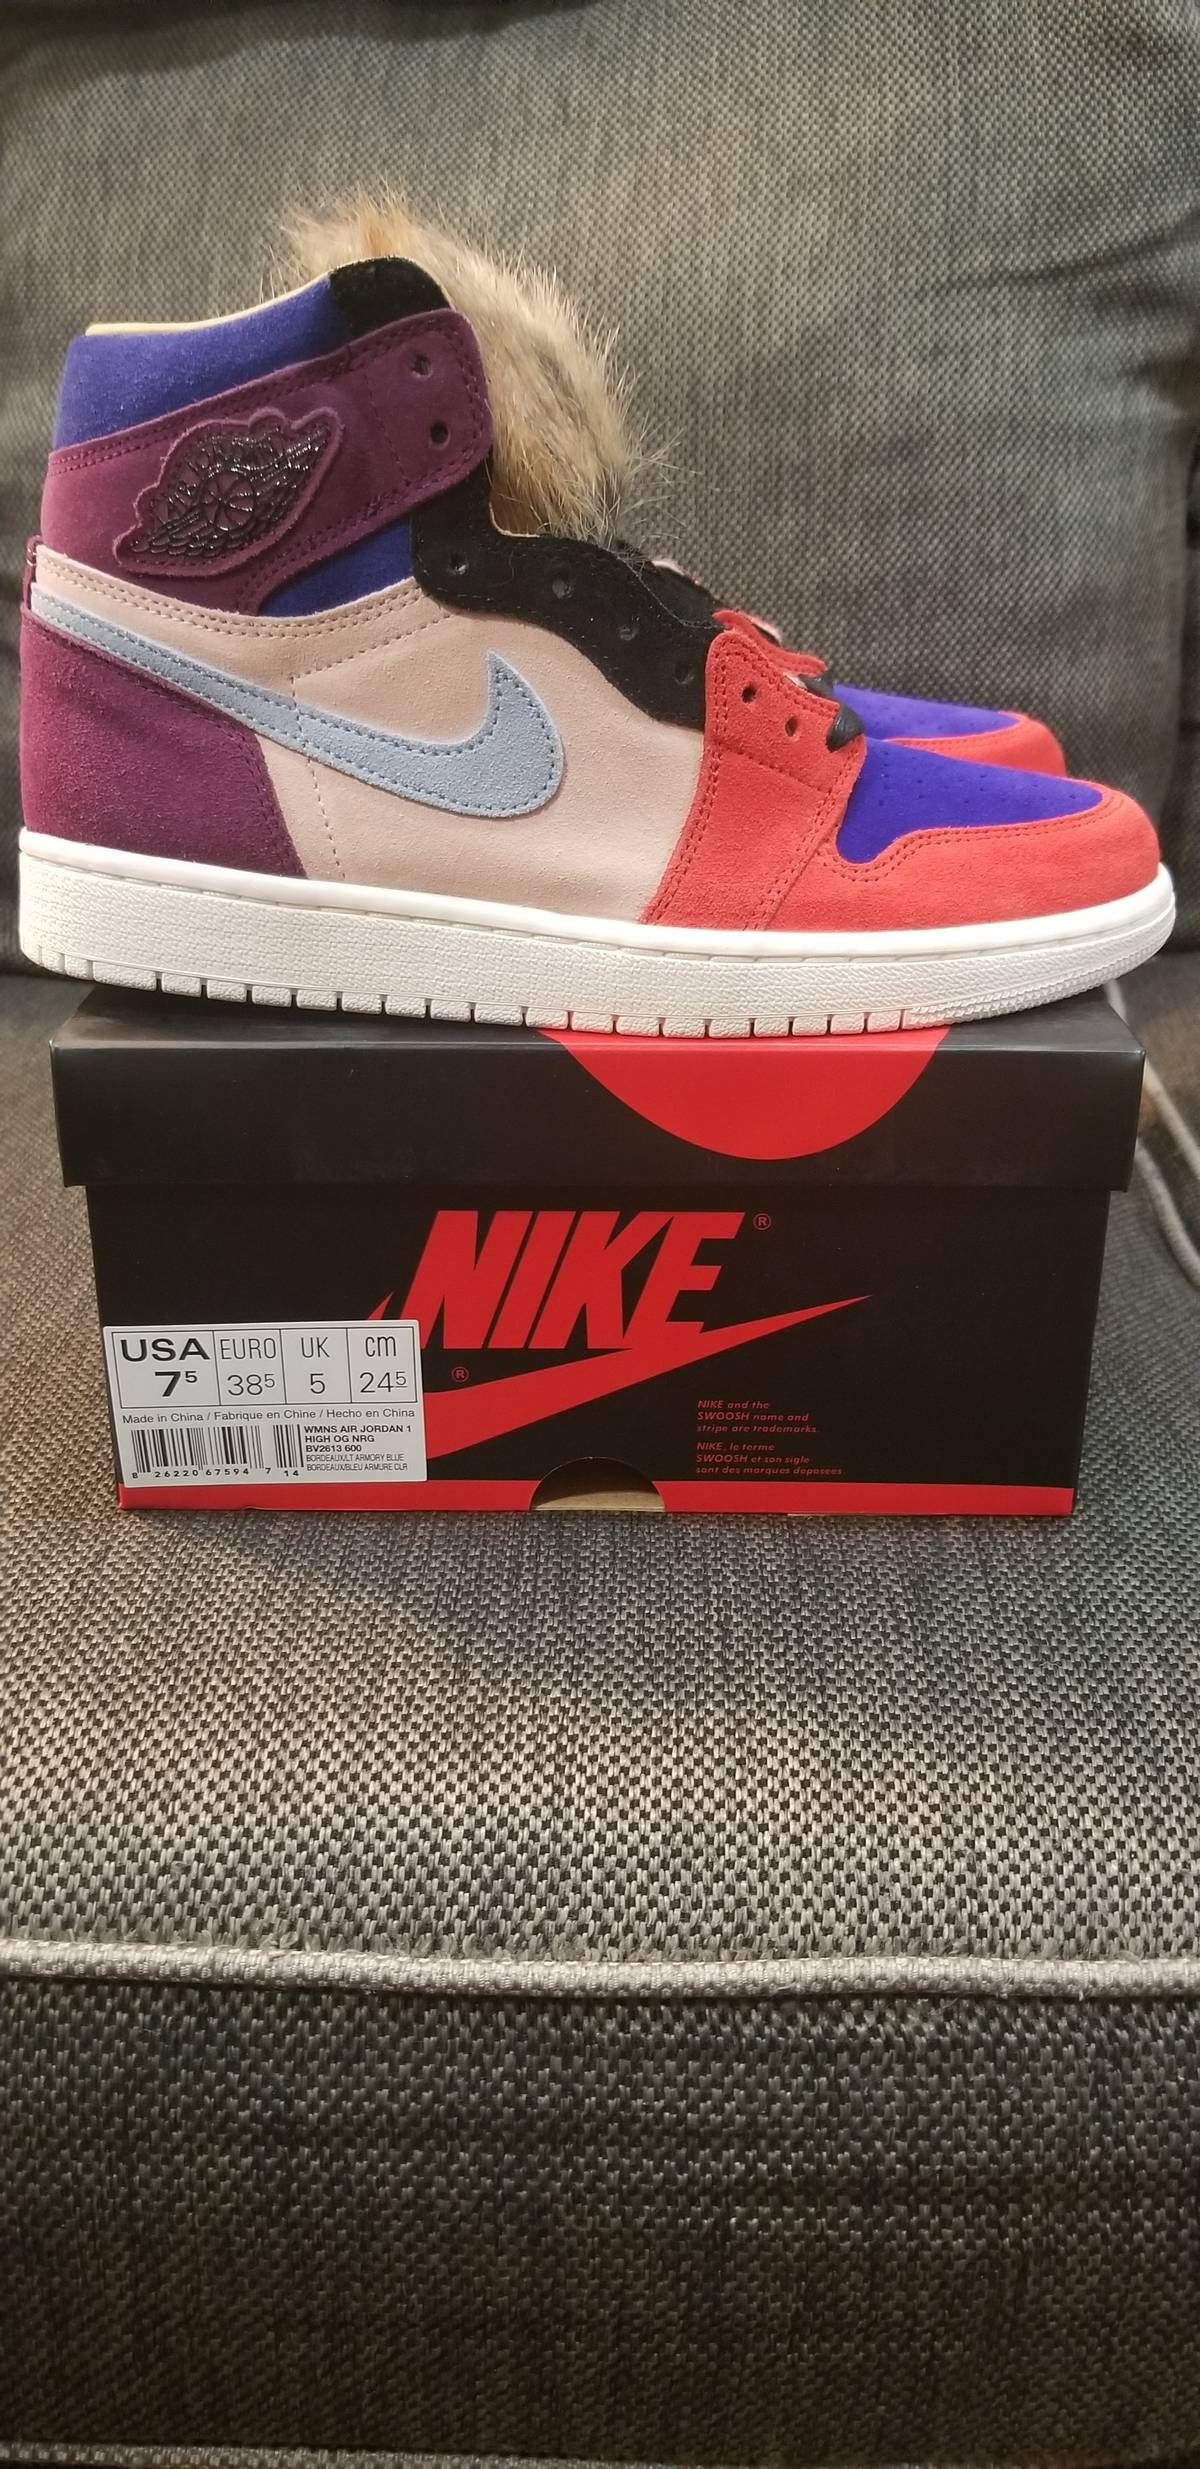 online store 7f1e0 05a59 Jordan Brand Aleali May X Wmns Air Jordan 1 Retro High